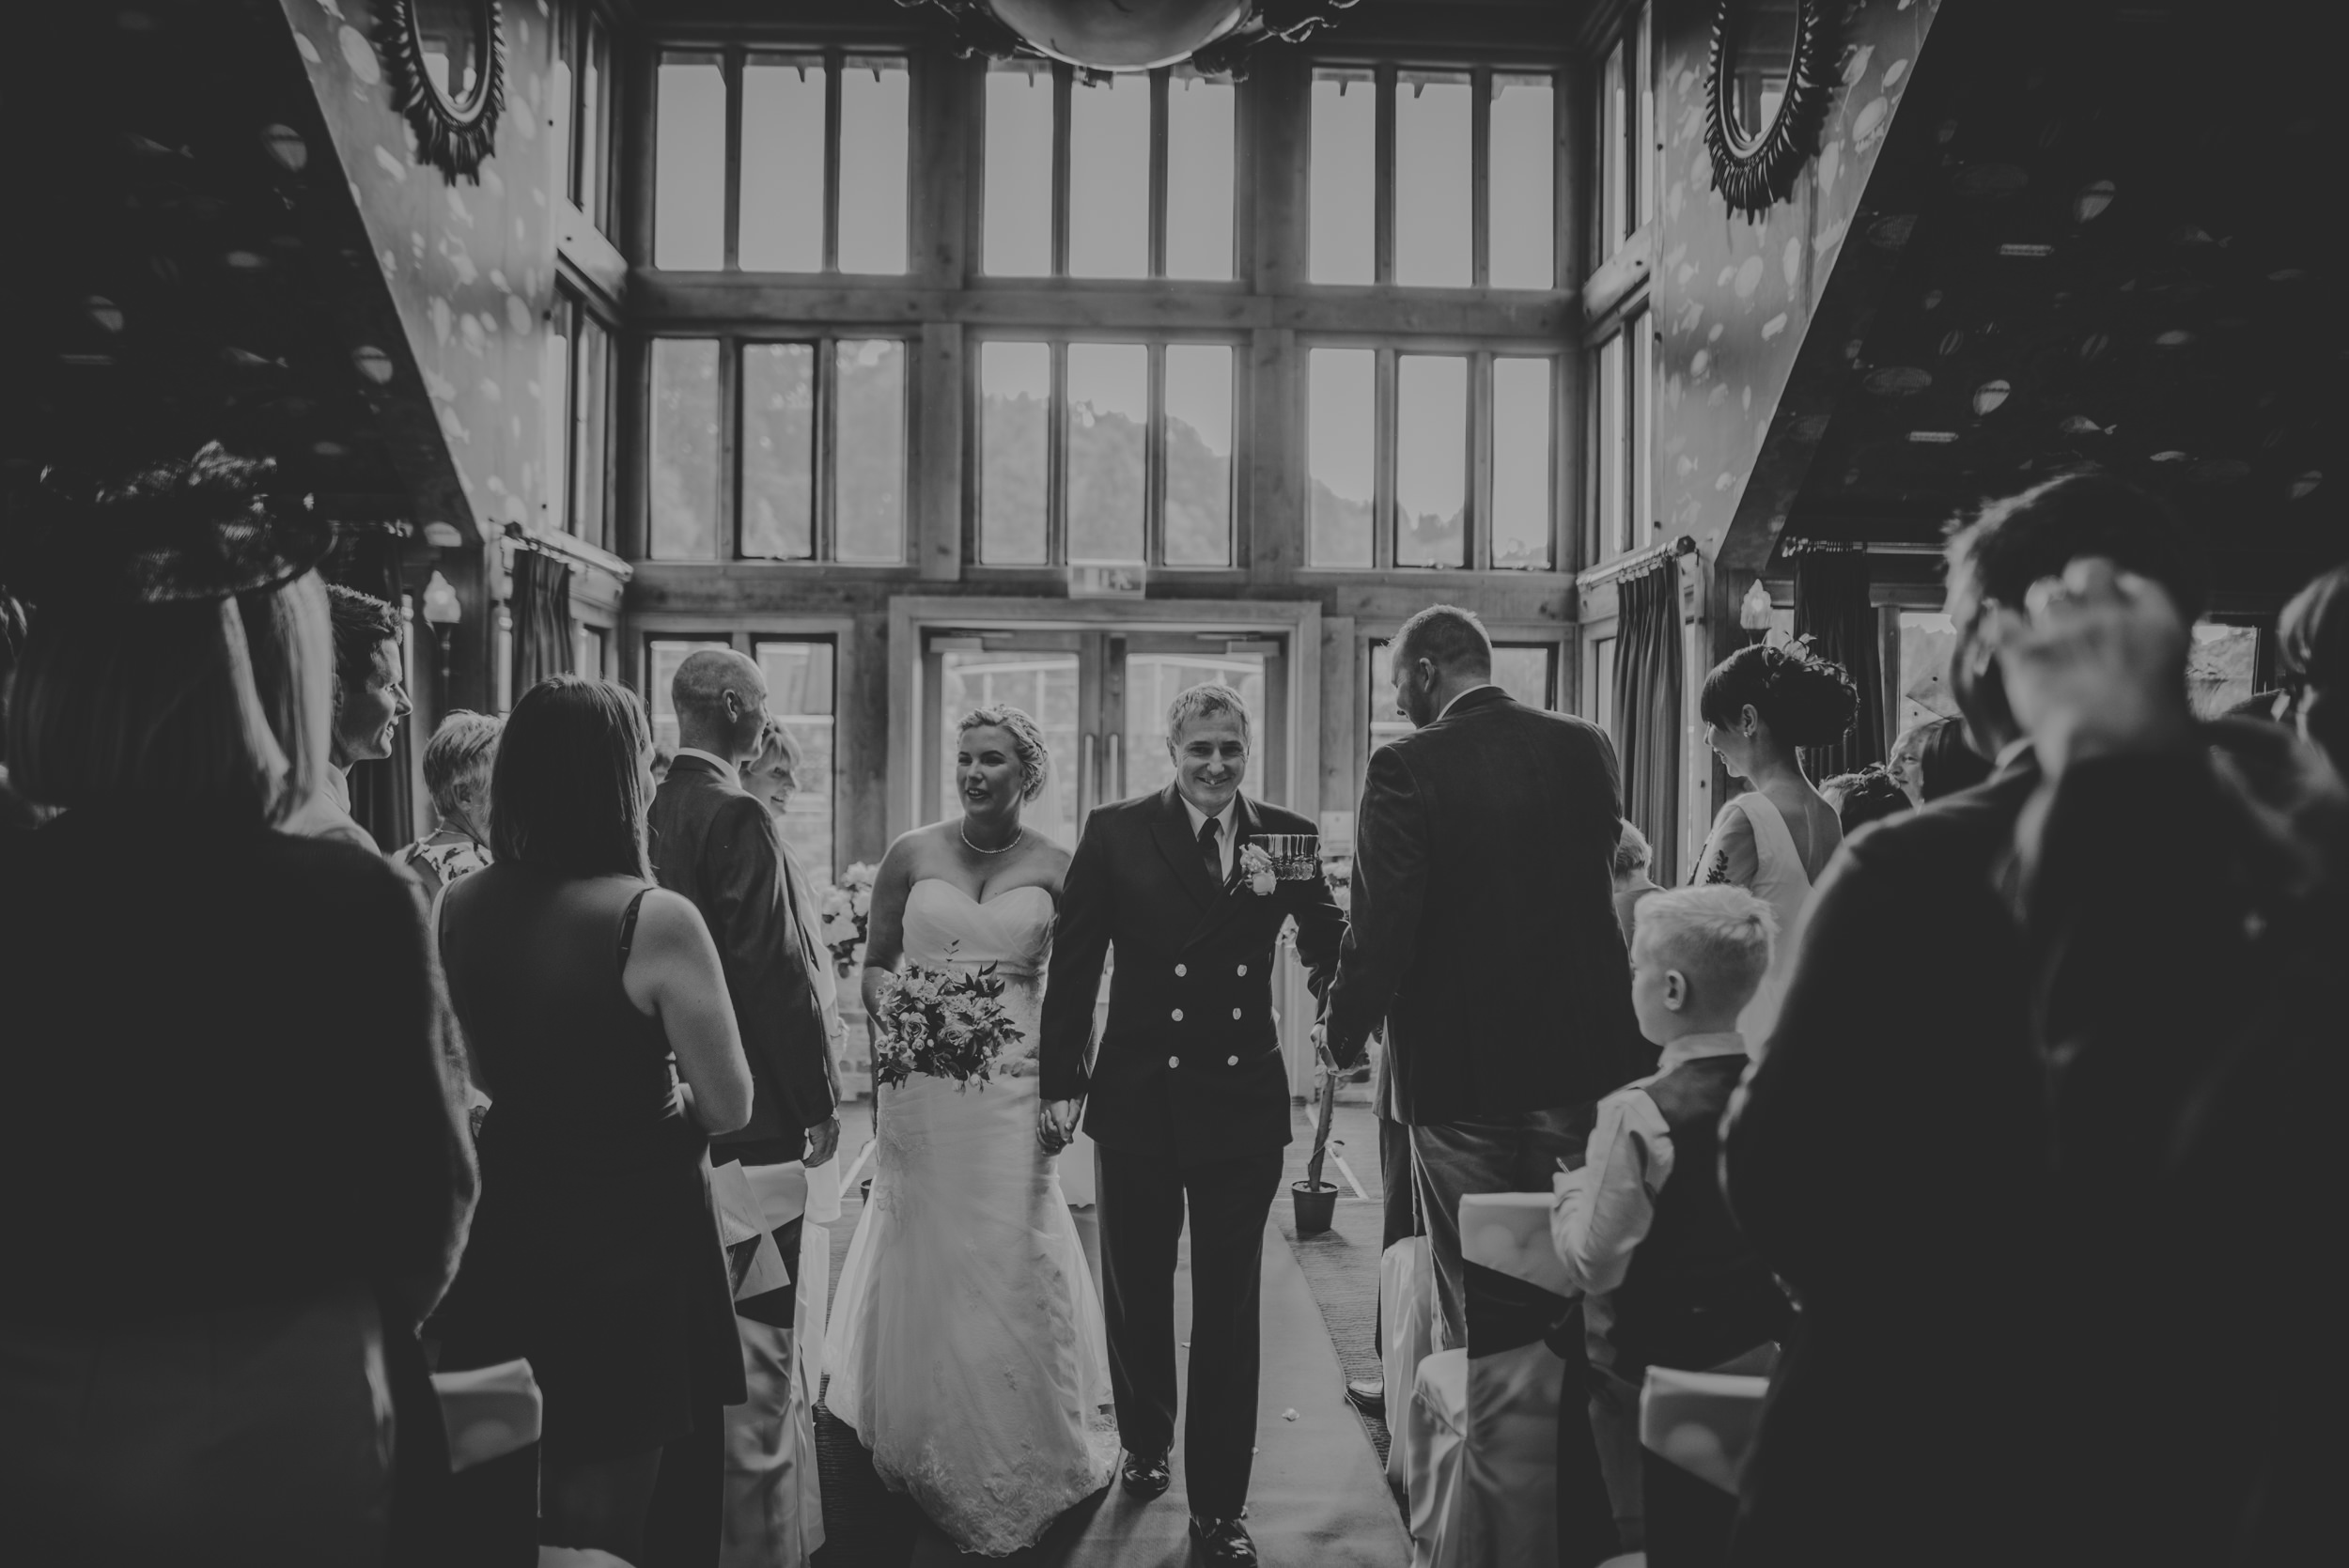 Chantelle-and-Stephen-Old-Thorns-Hotel-Wedding-Liphook-Manu-Mendoza-Wedding-Photography-248.jpg